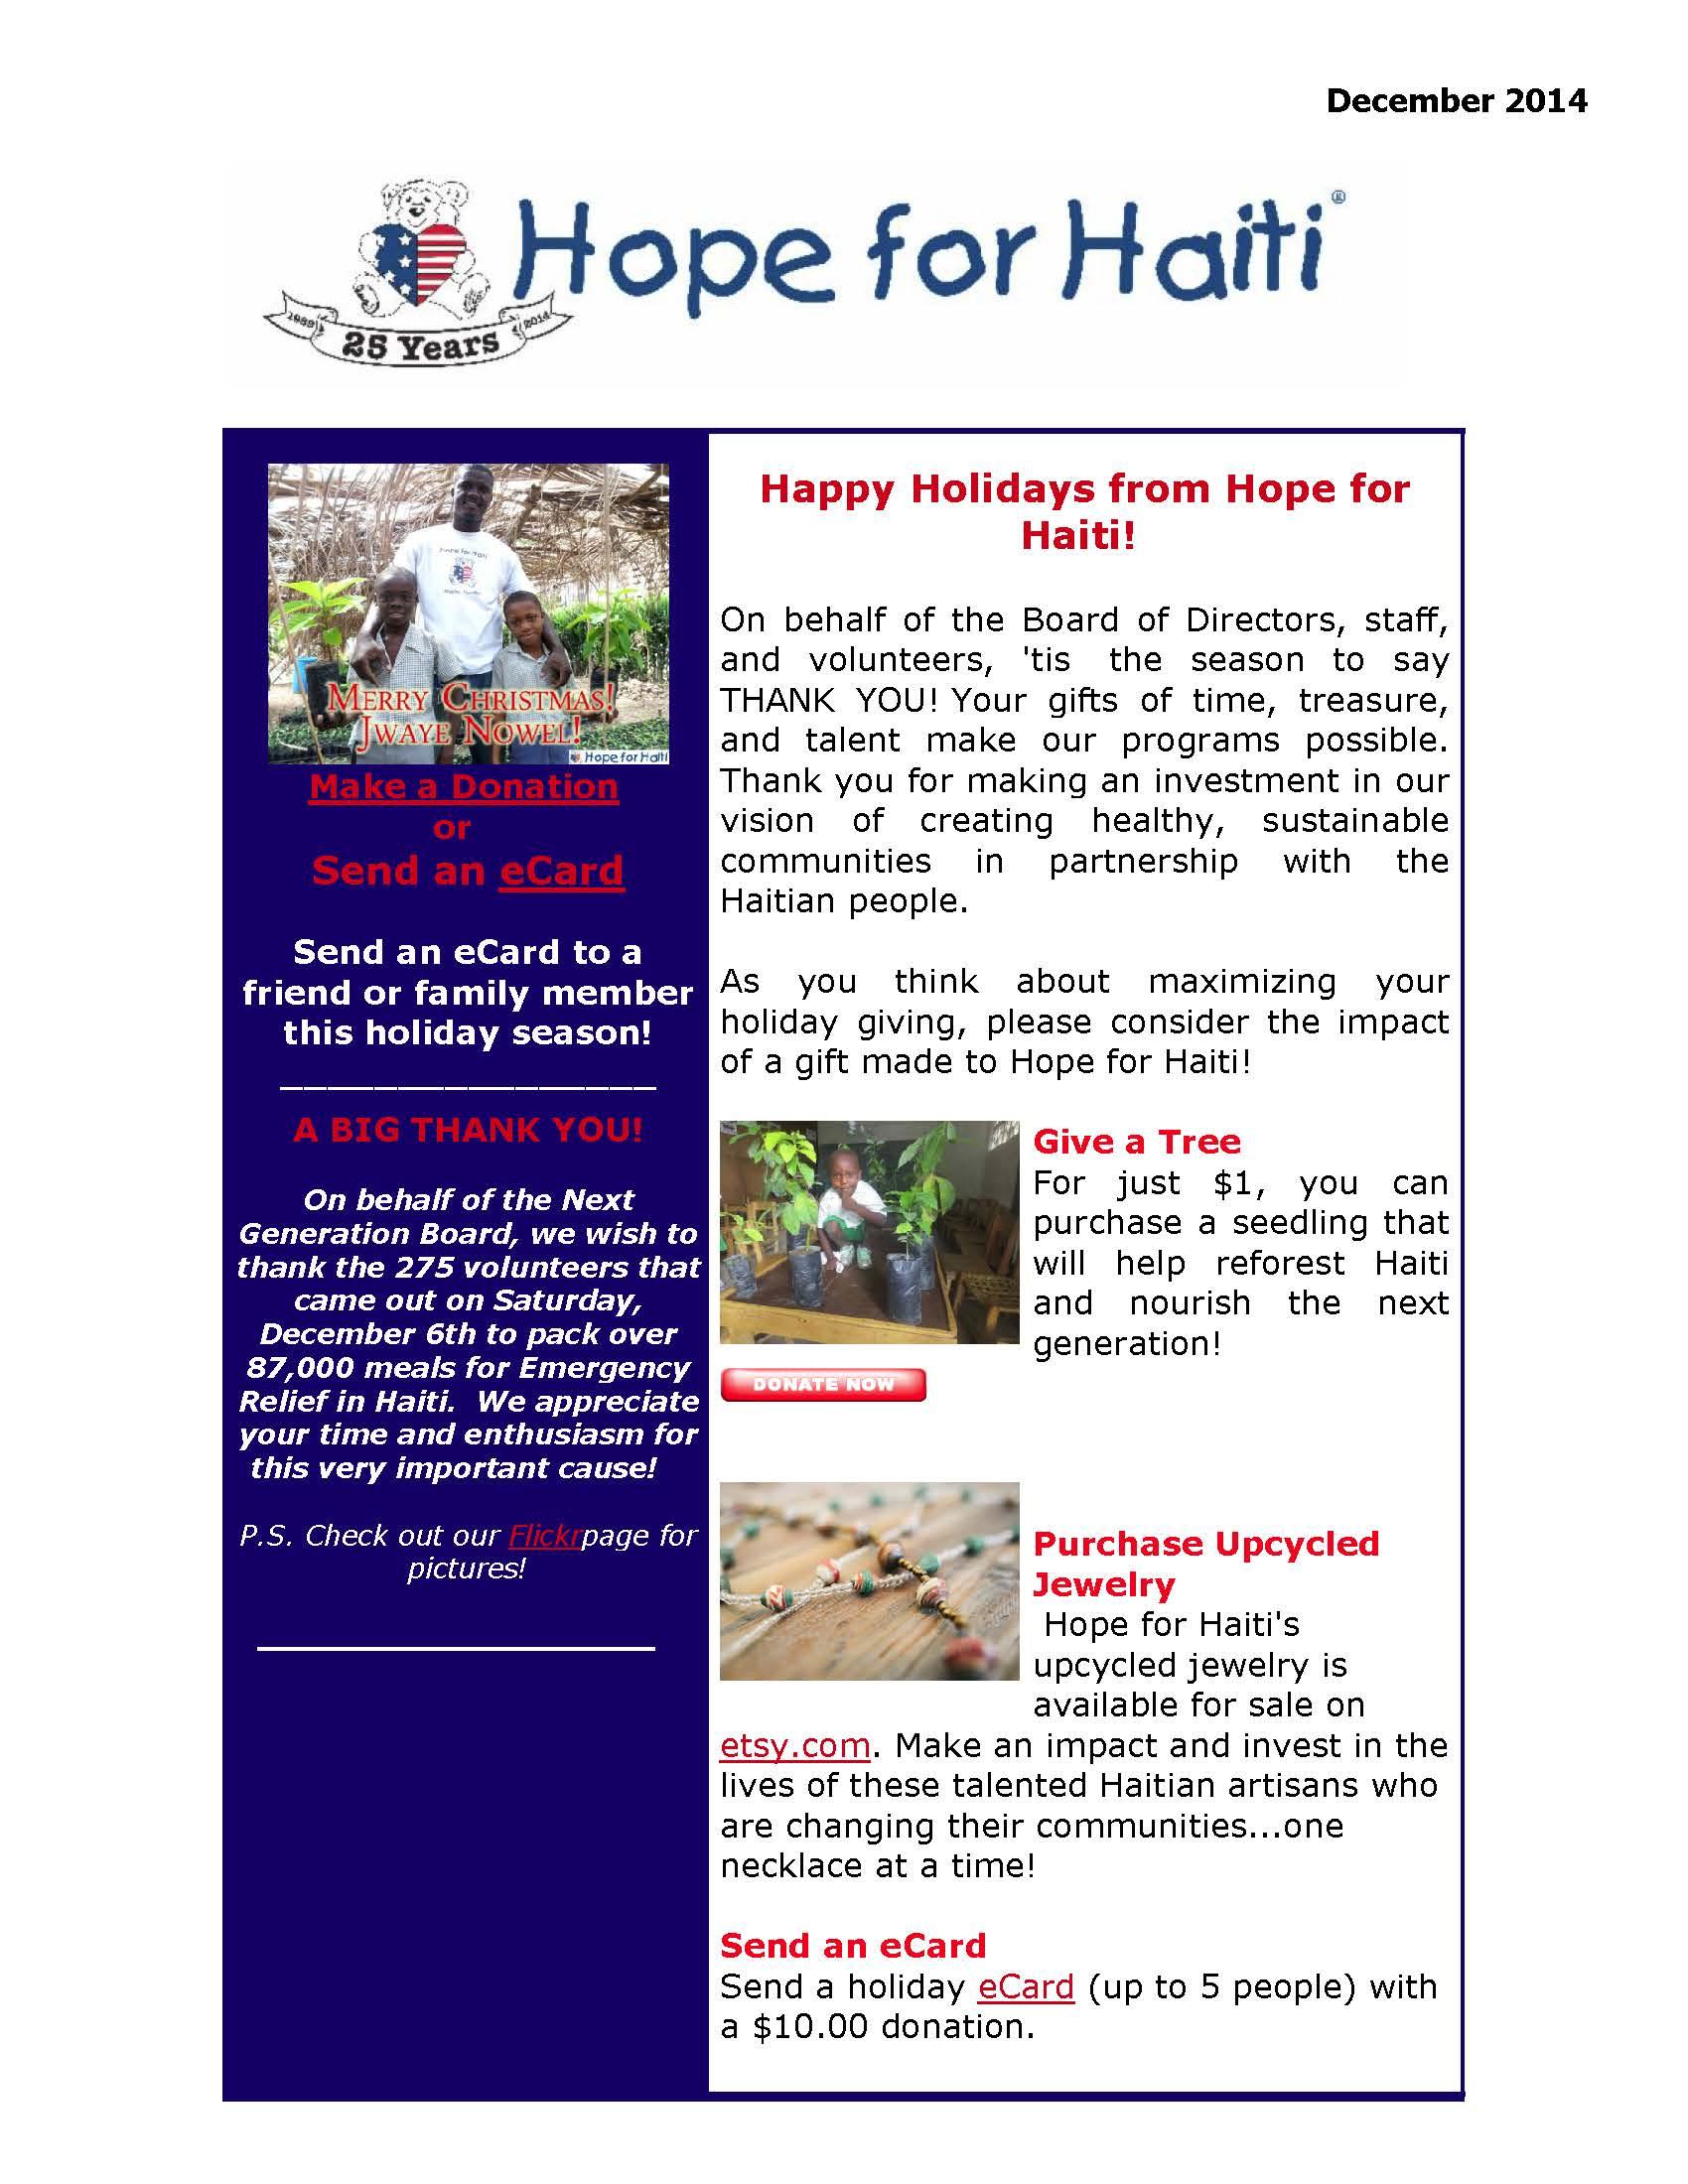 December egram 2014 page 1 December egram 2014 page 1 December egram 2014 page 1 December egram 2014 page 1